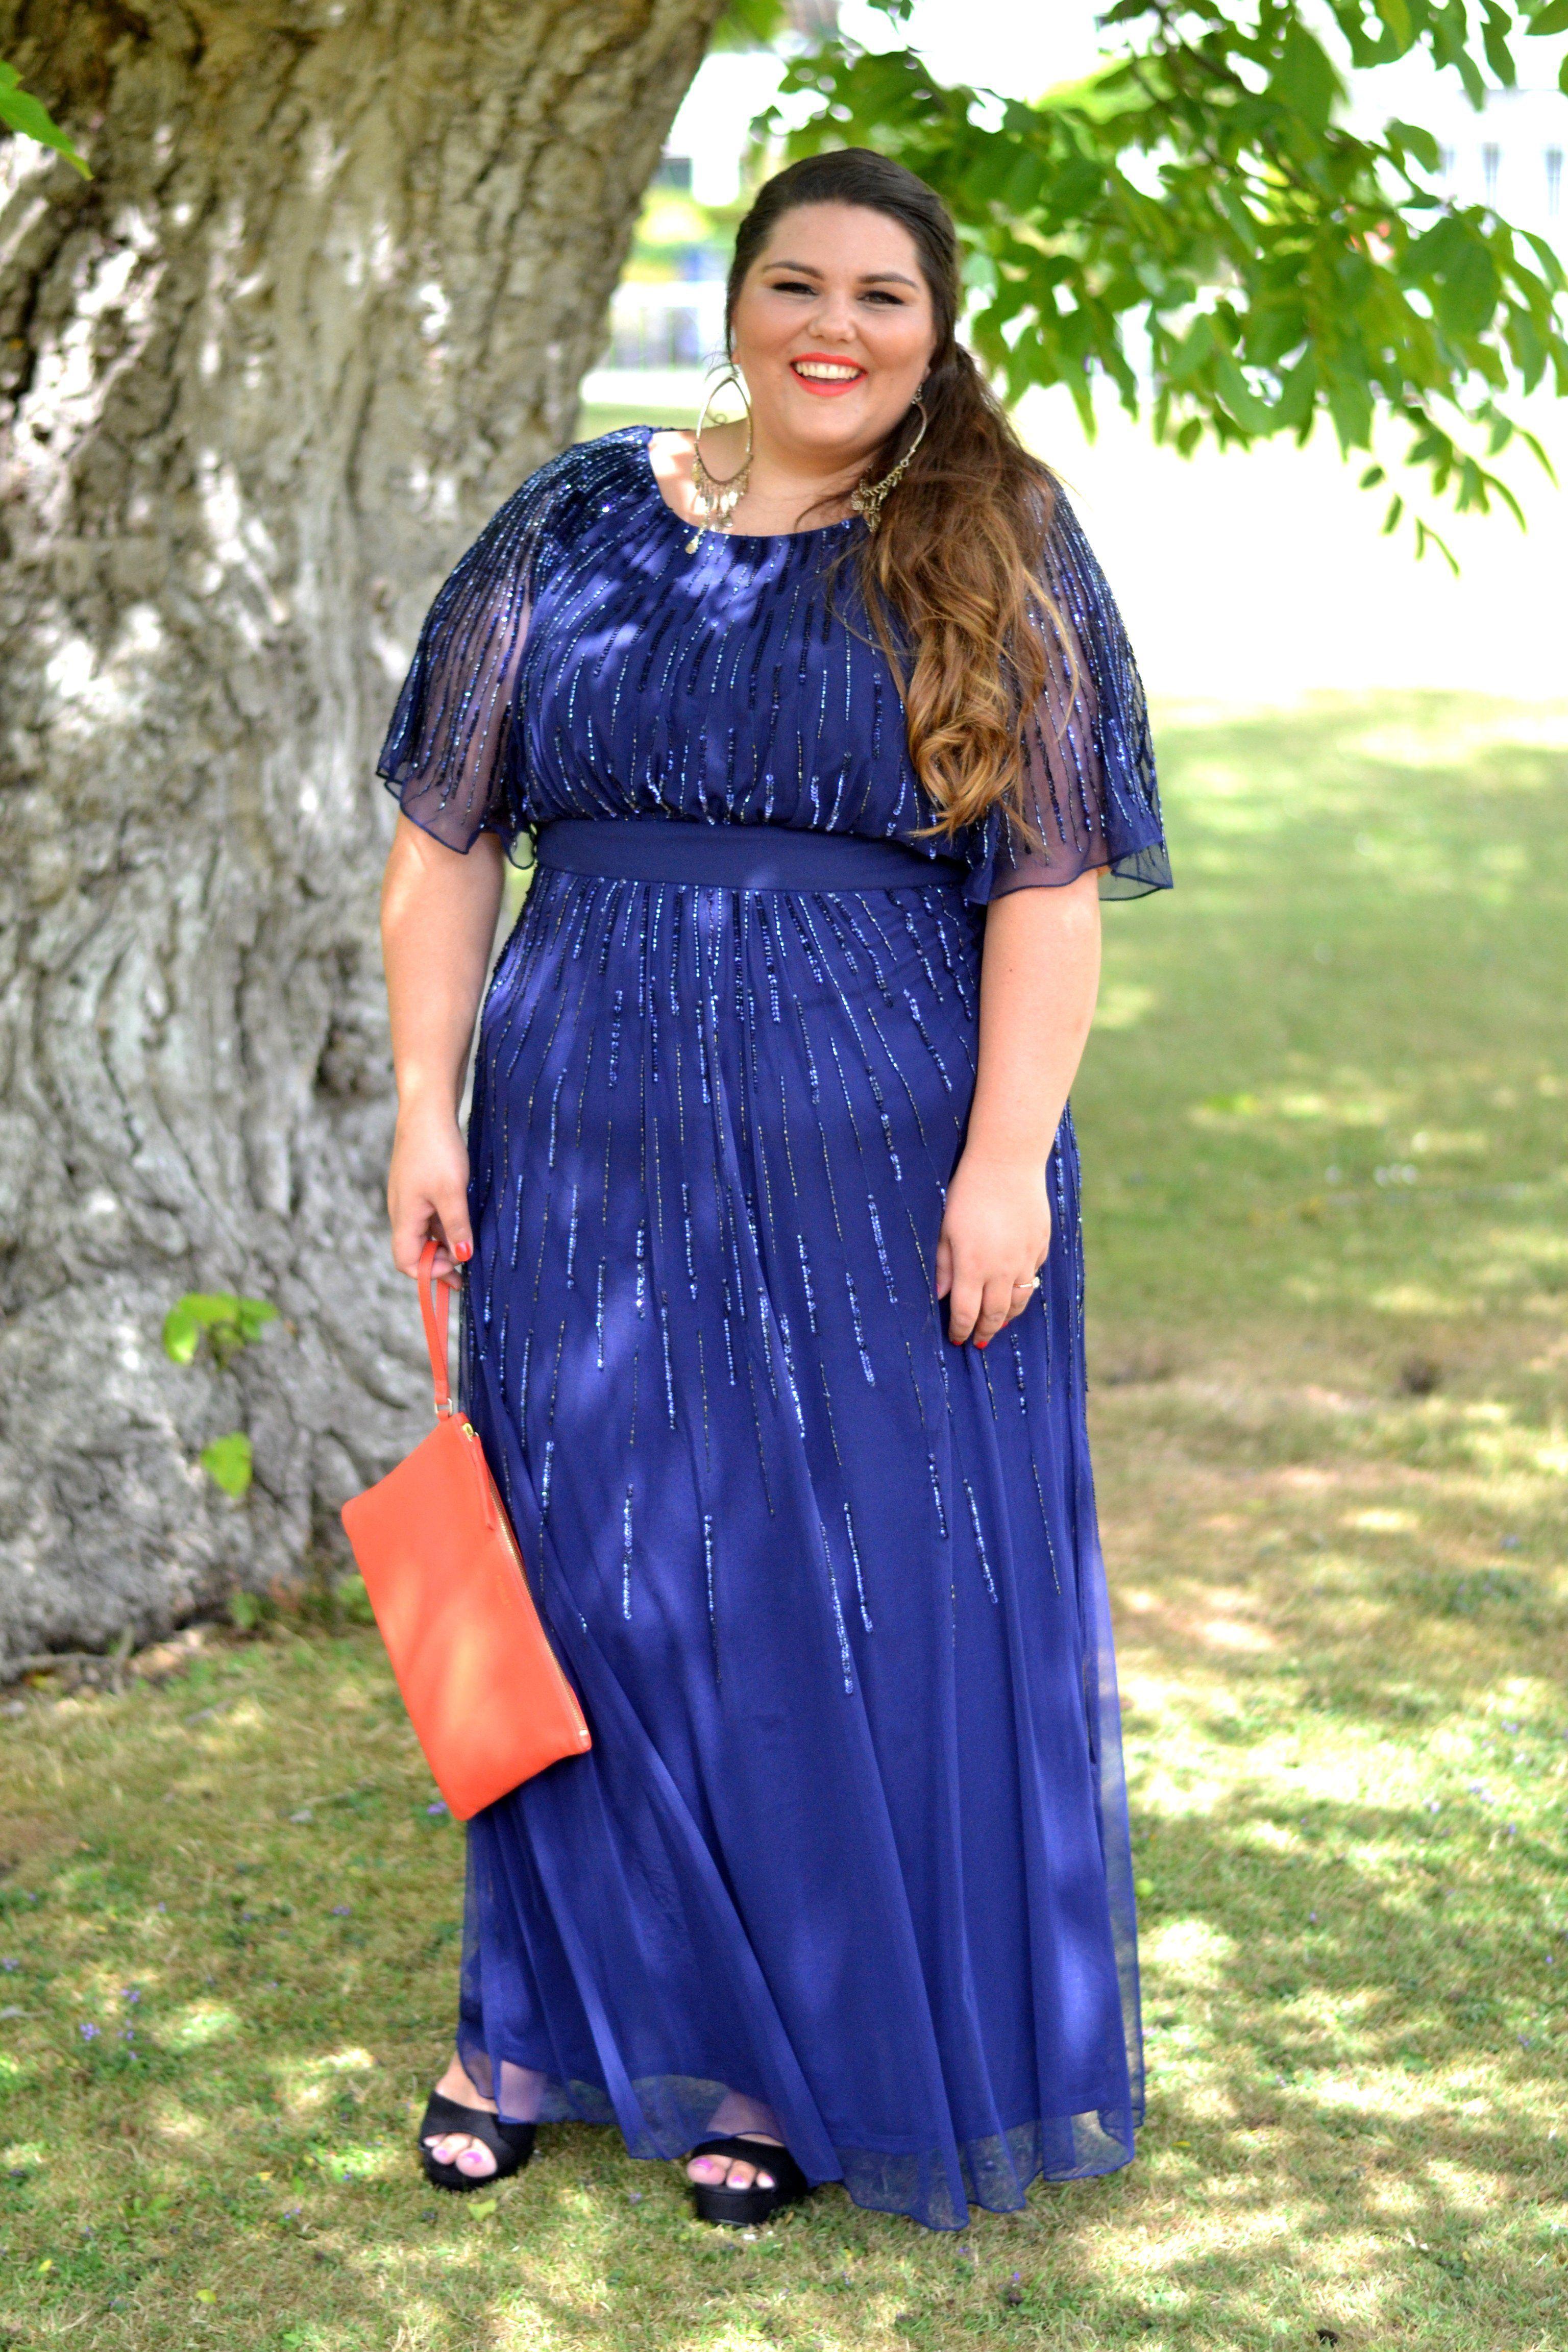 Studio 8 - The Darcey Dress | Plus size fashion | Pinterest ...